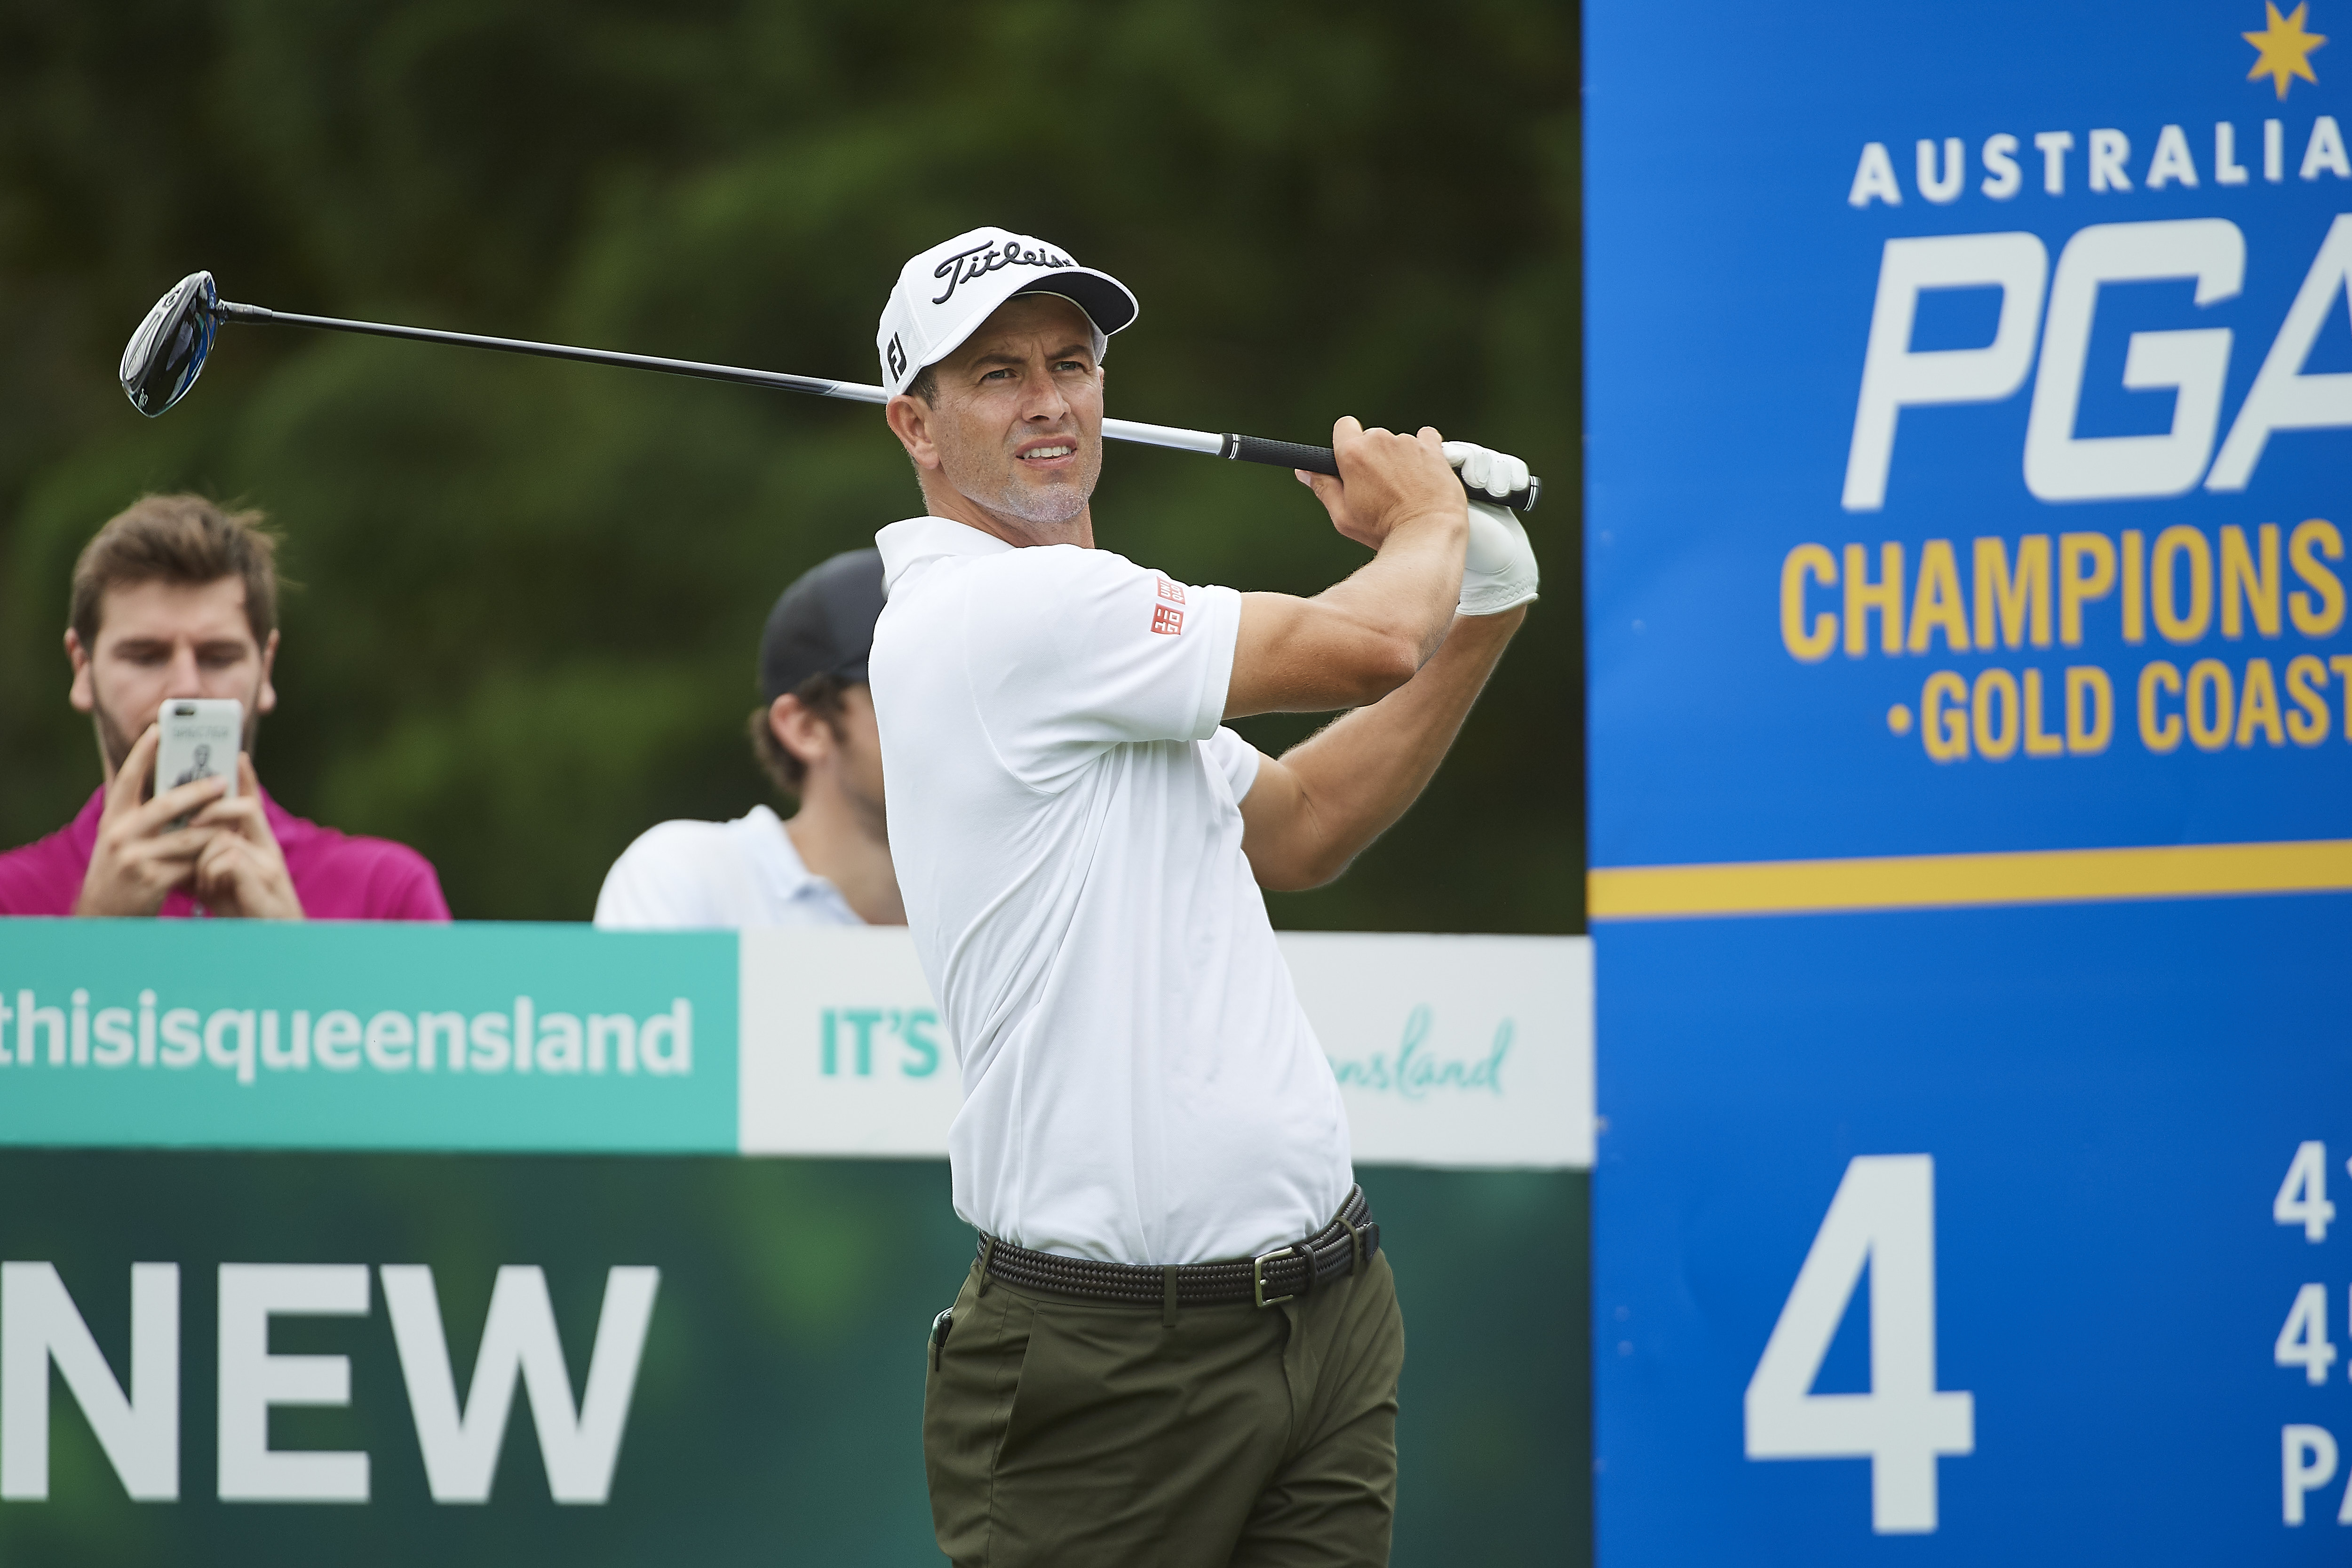 2017 Australian PGA Championships